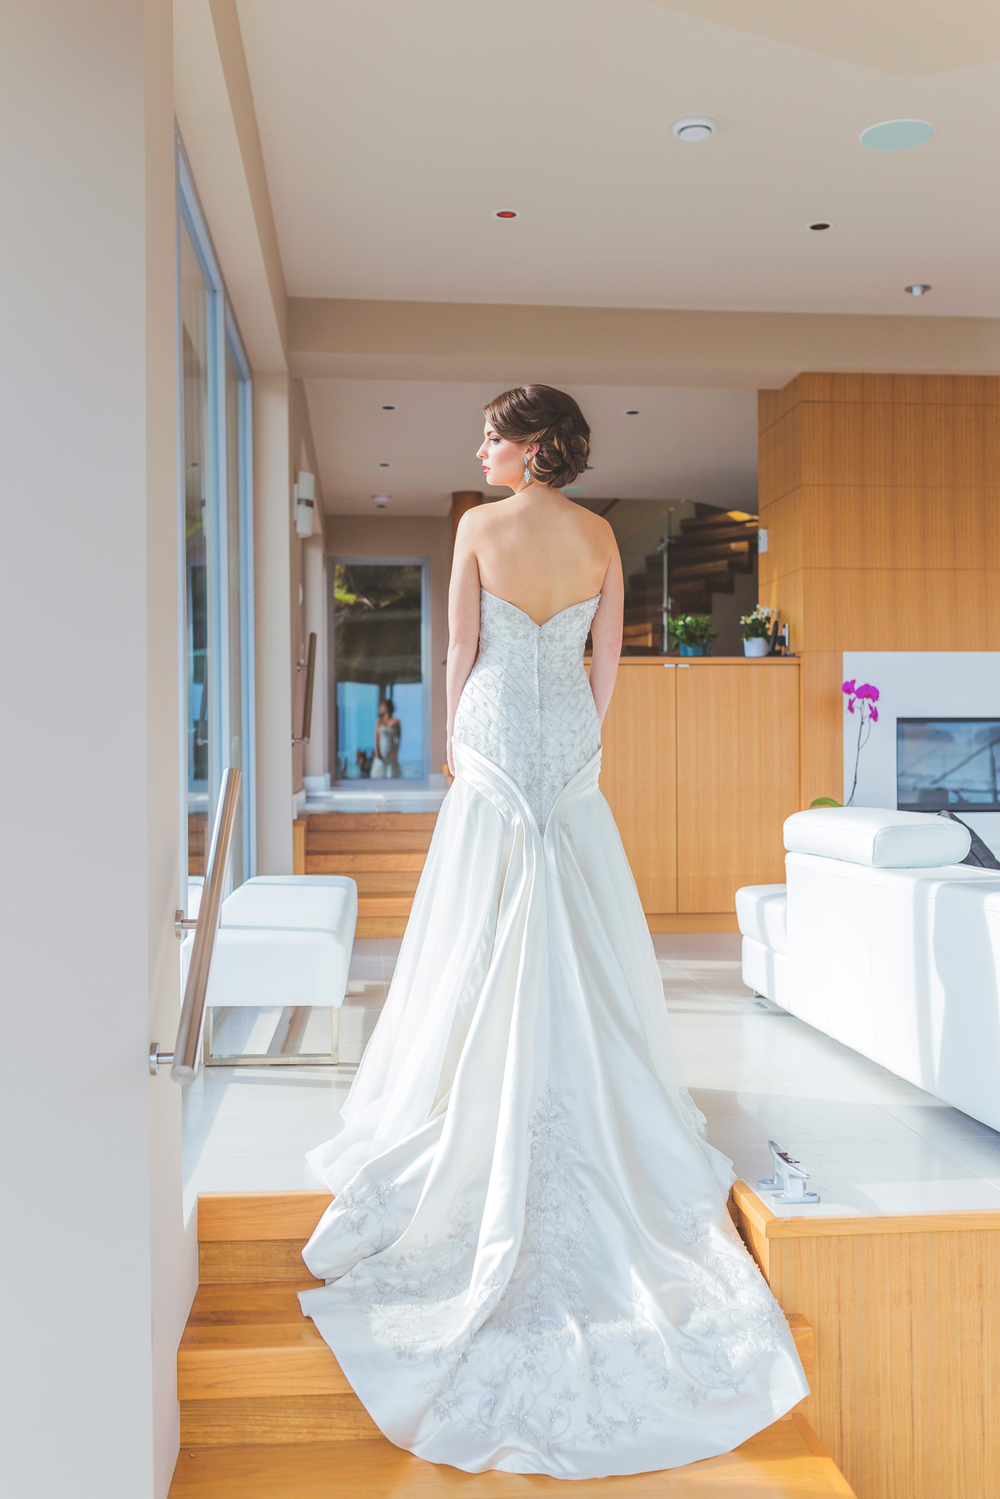 IMG_6321-BRIDAL-EDITORIAL-JENNIFER-PICARD-PHOTOGRAPHY-FINE-ART-WEDDINGS.jpg